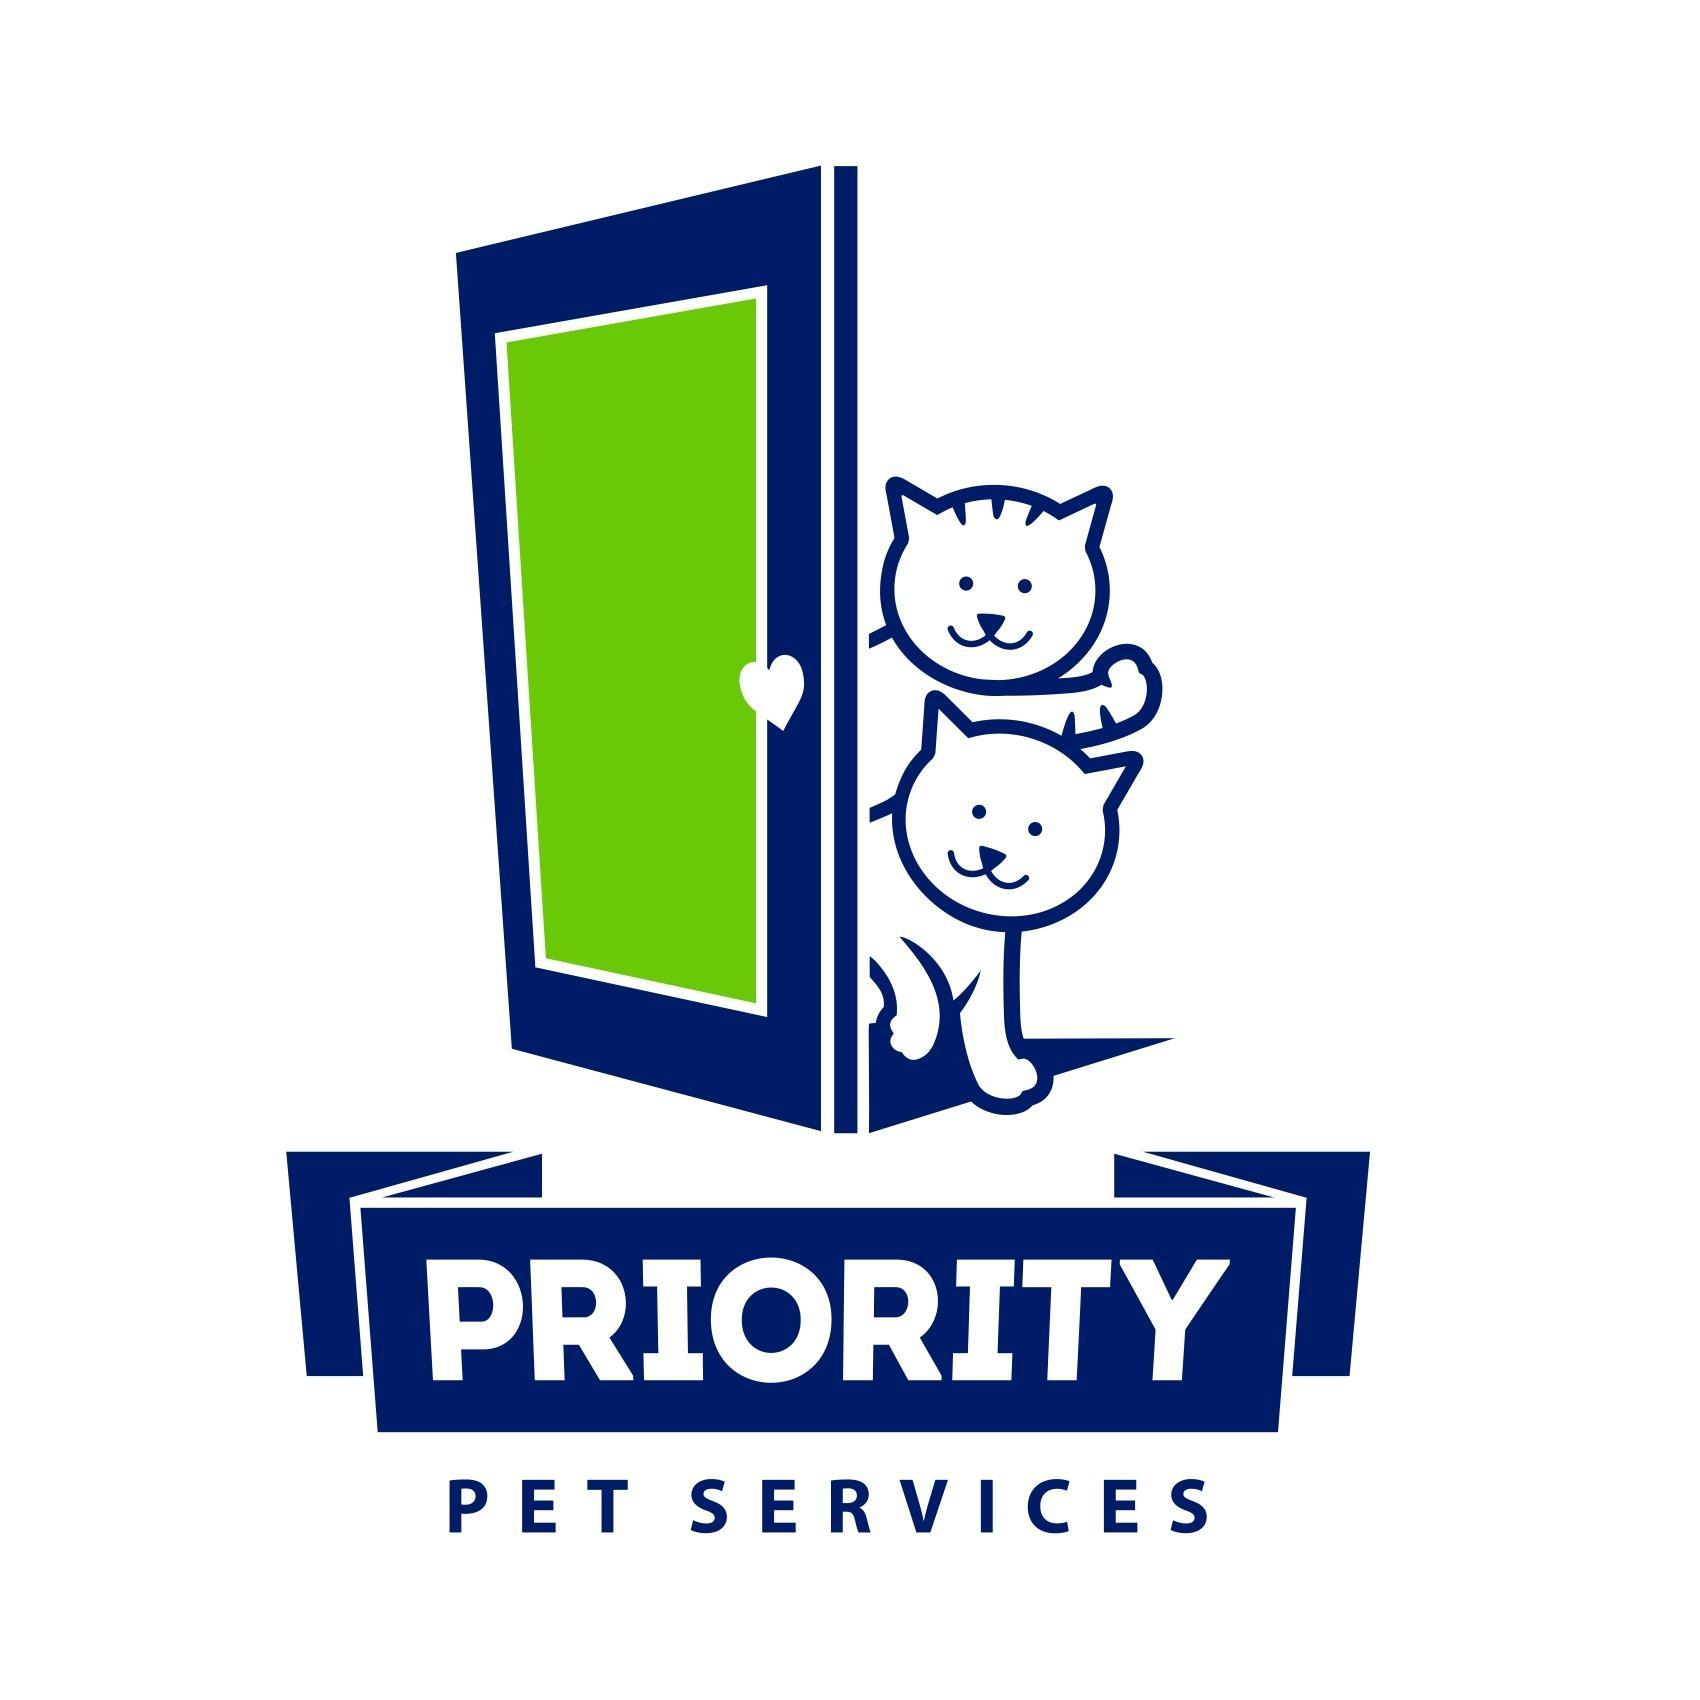 Priority Pet Services